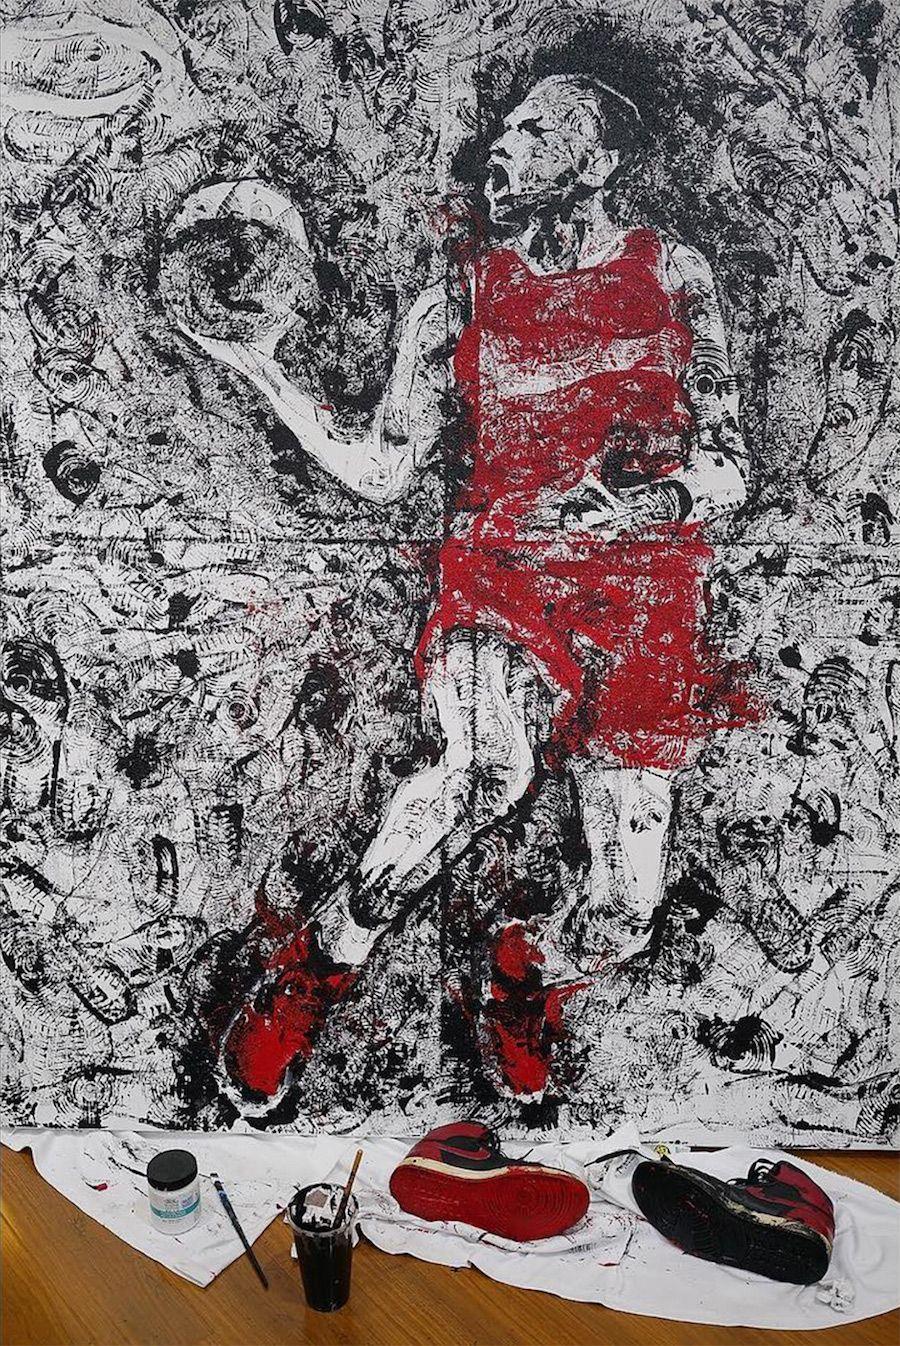 9bb21da0f3b6 Air Jordan 1 Banned Paintbrush Michael Jordan